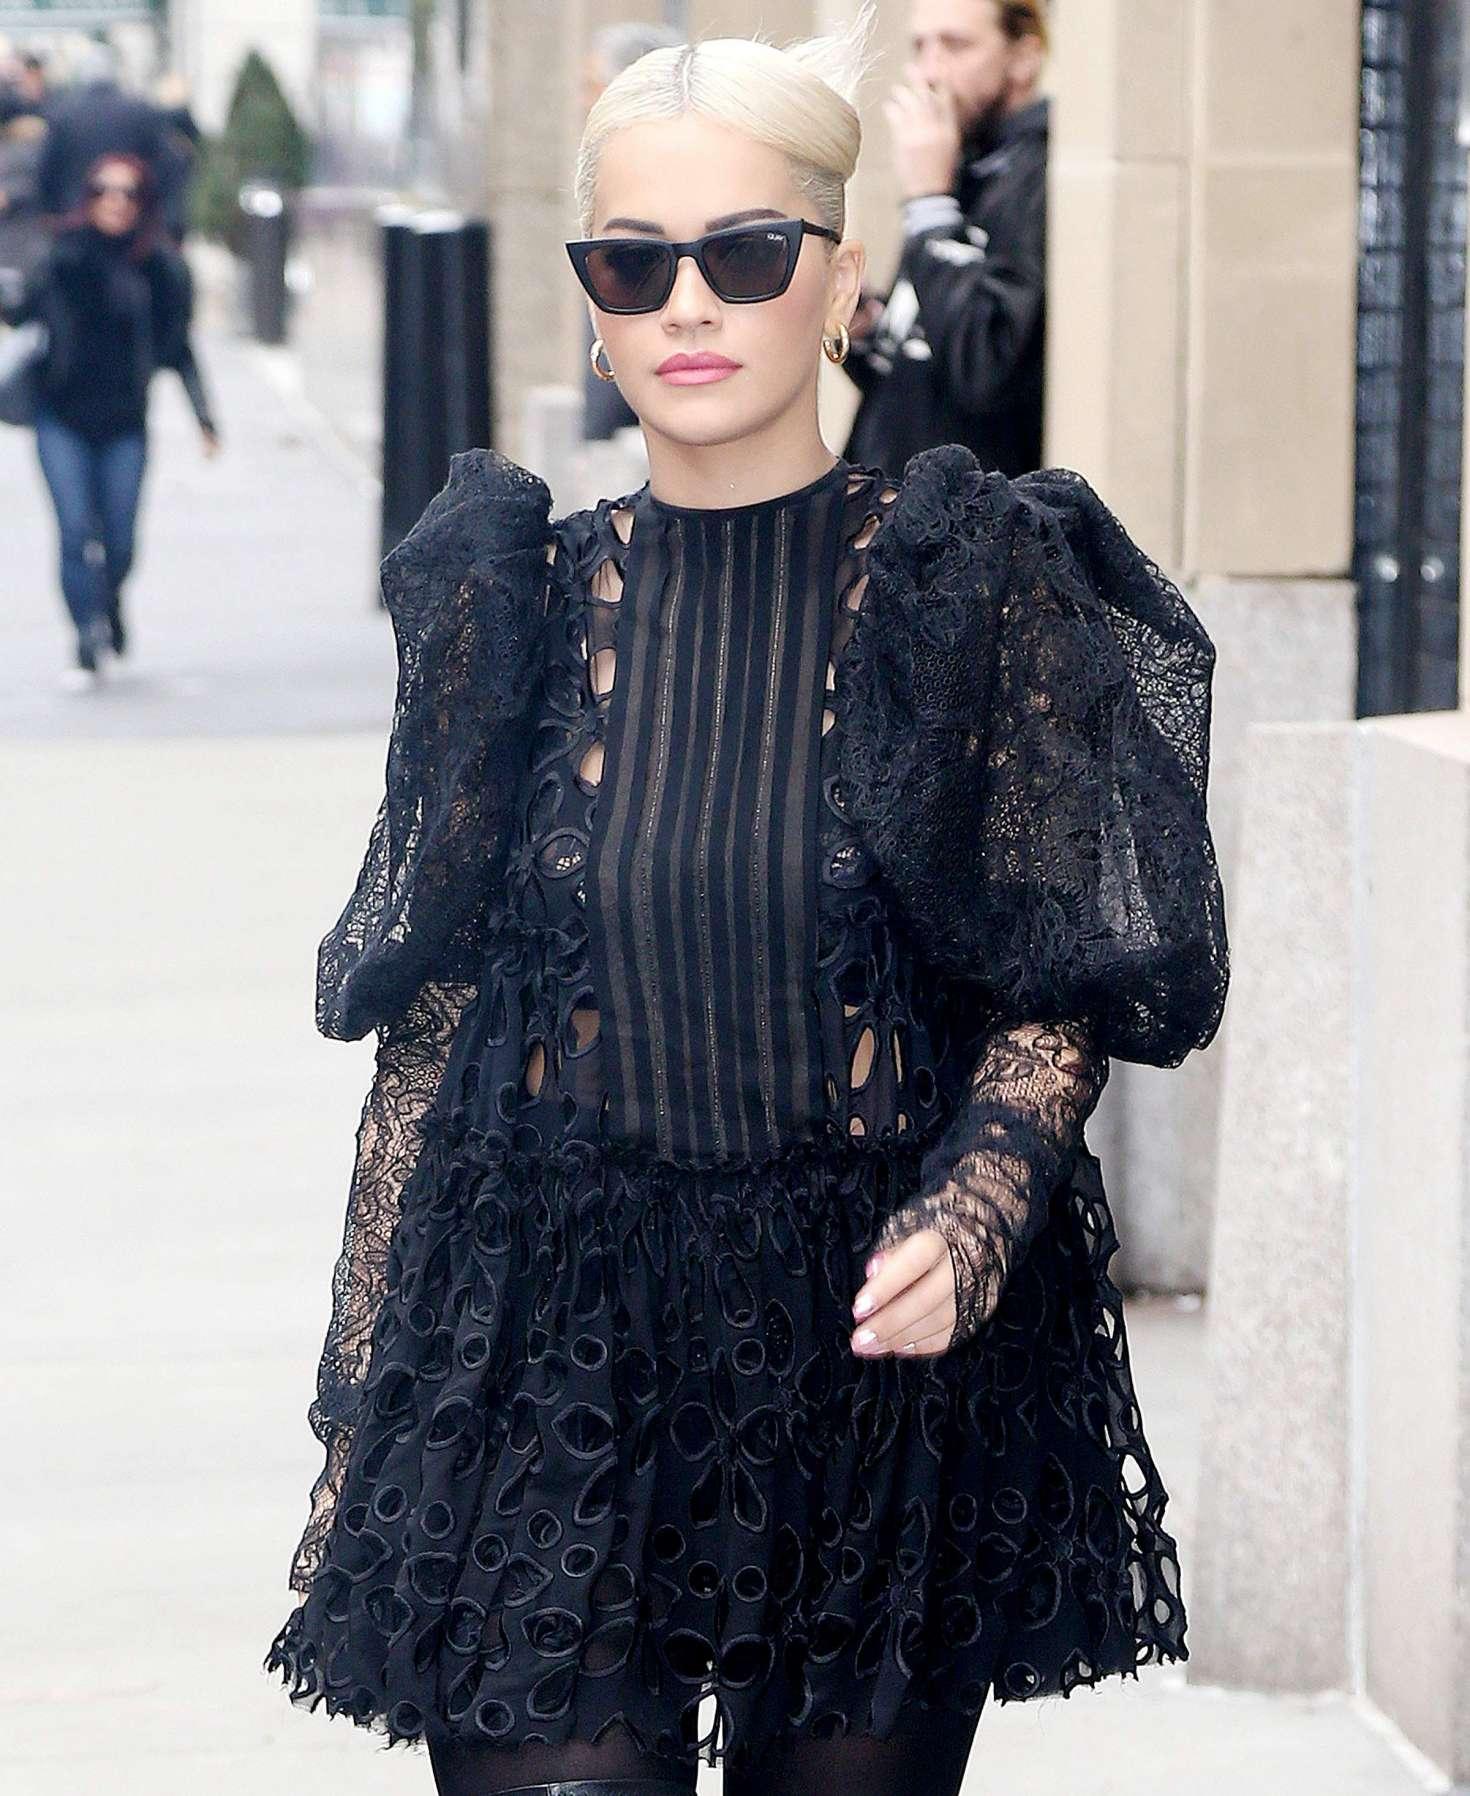 Rita Ora 2016 : Rita Ora in Black Mini Dress -07